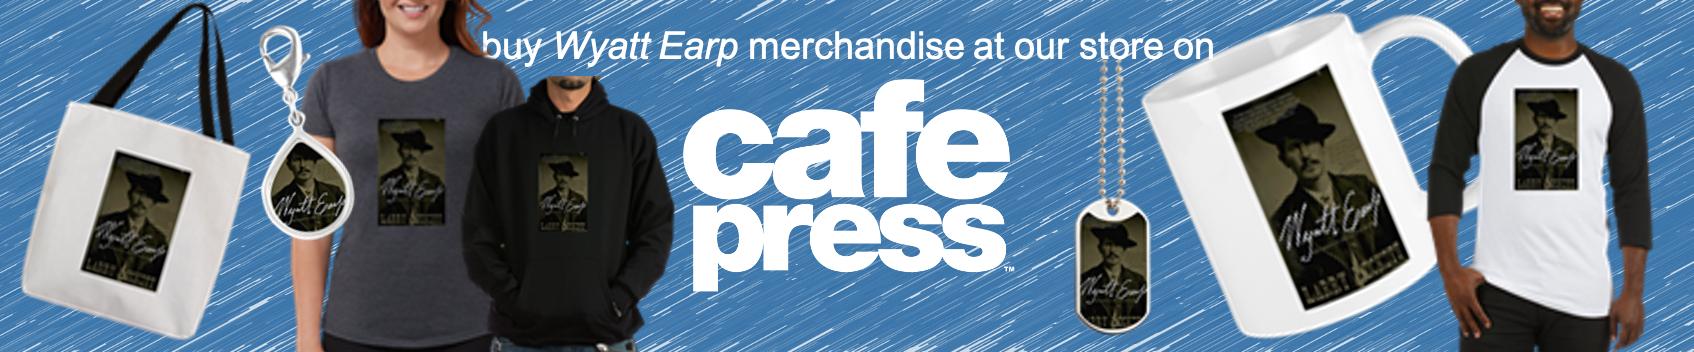 Buy Wyatt Earp merchandise at Cafe Press